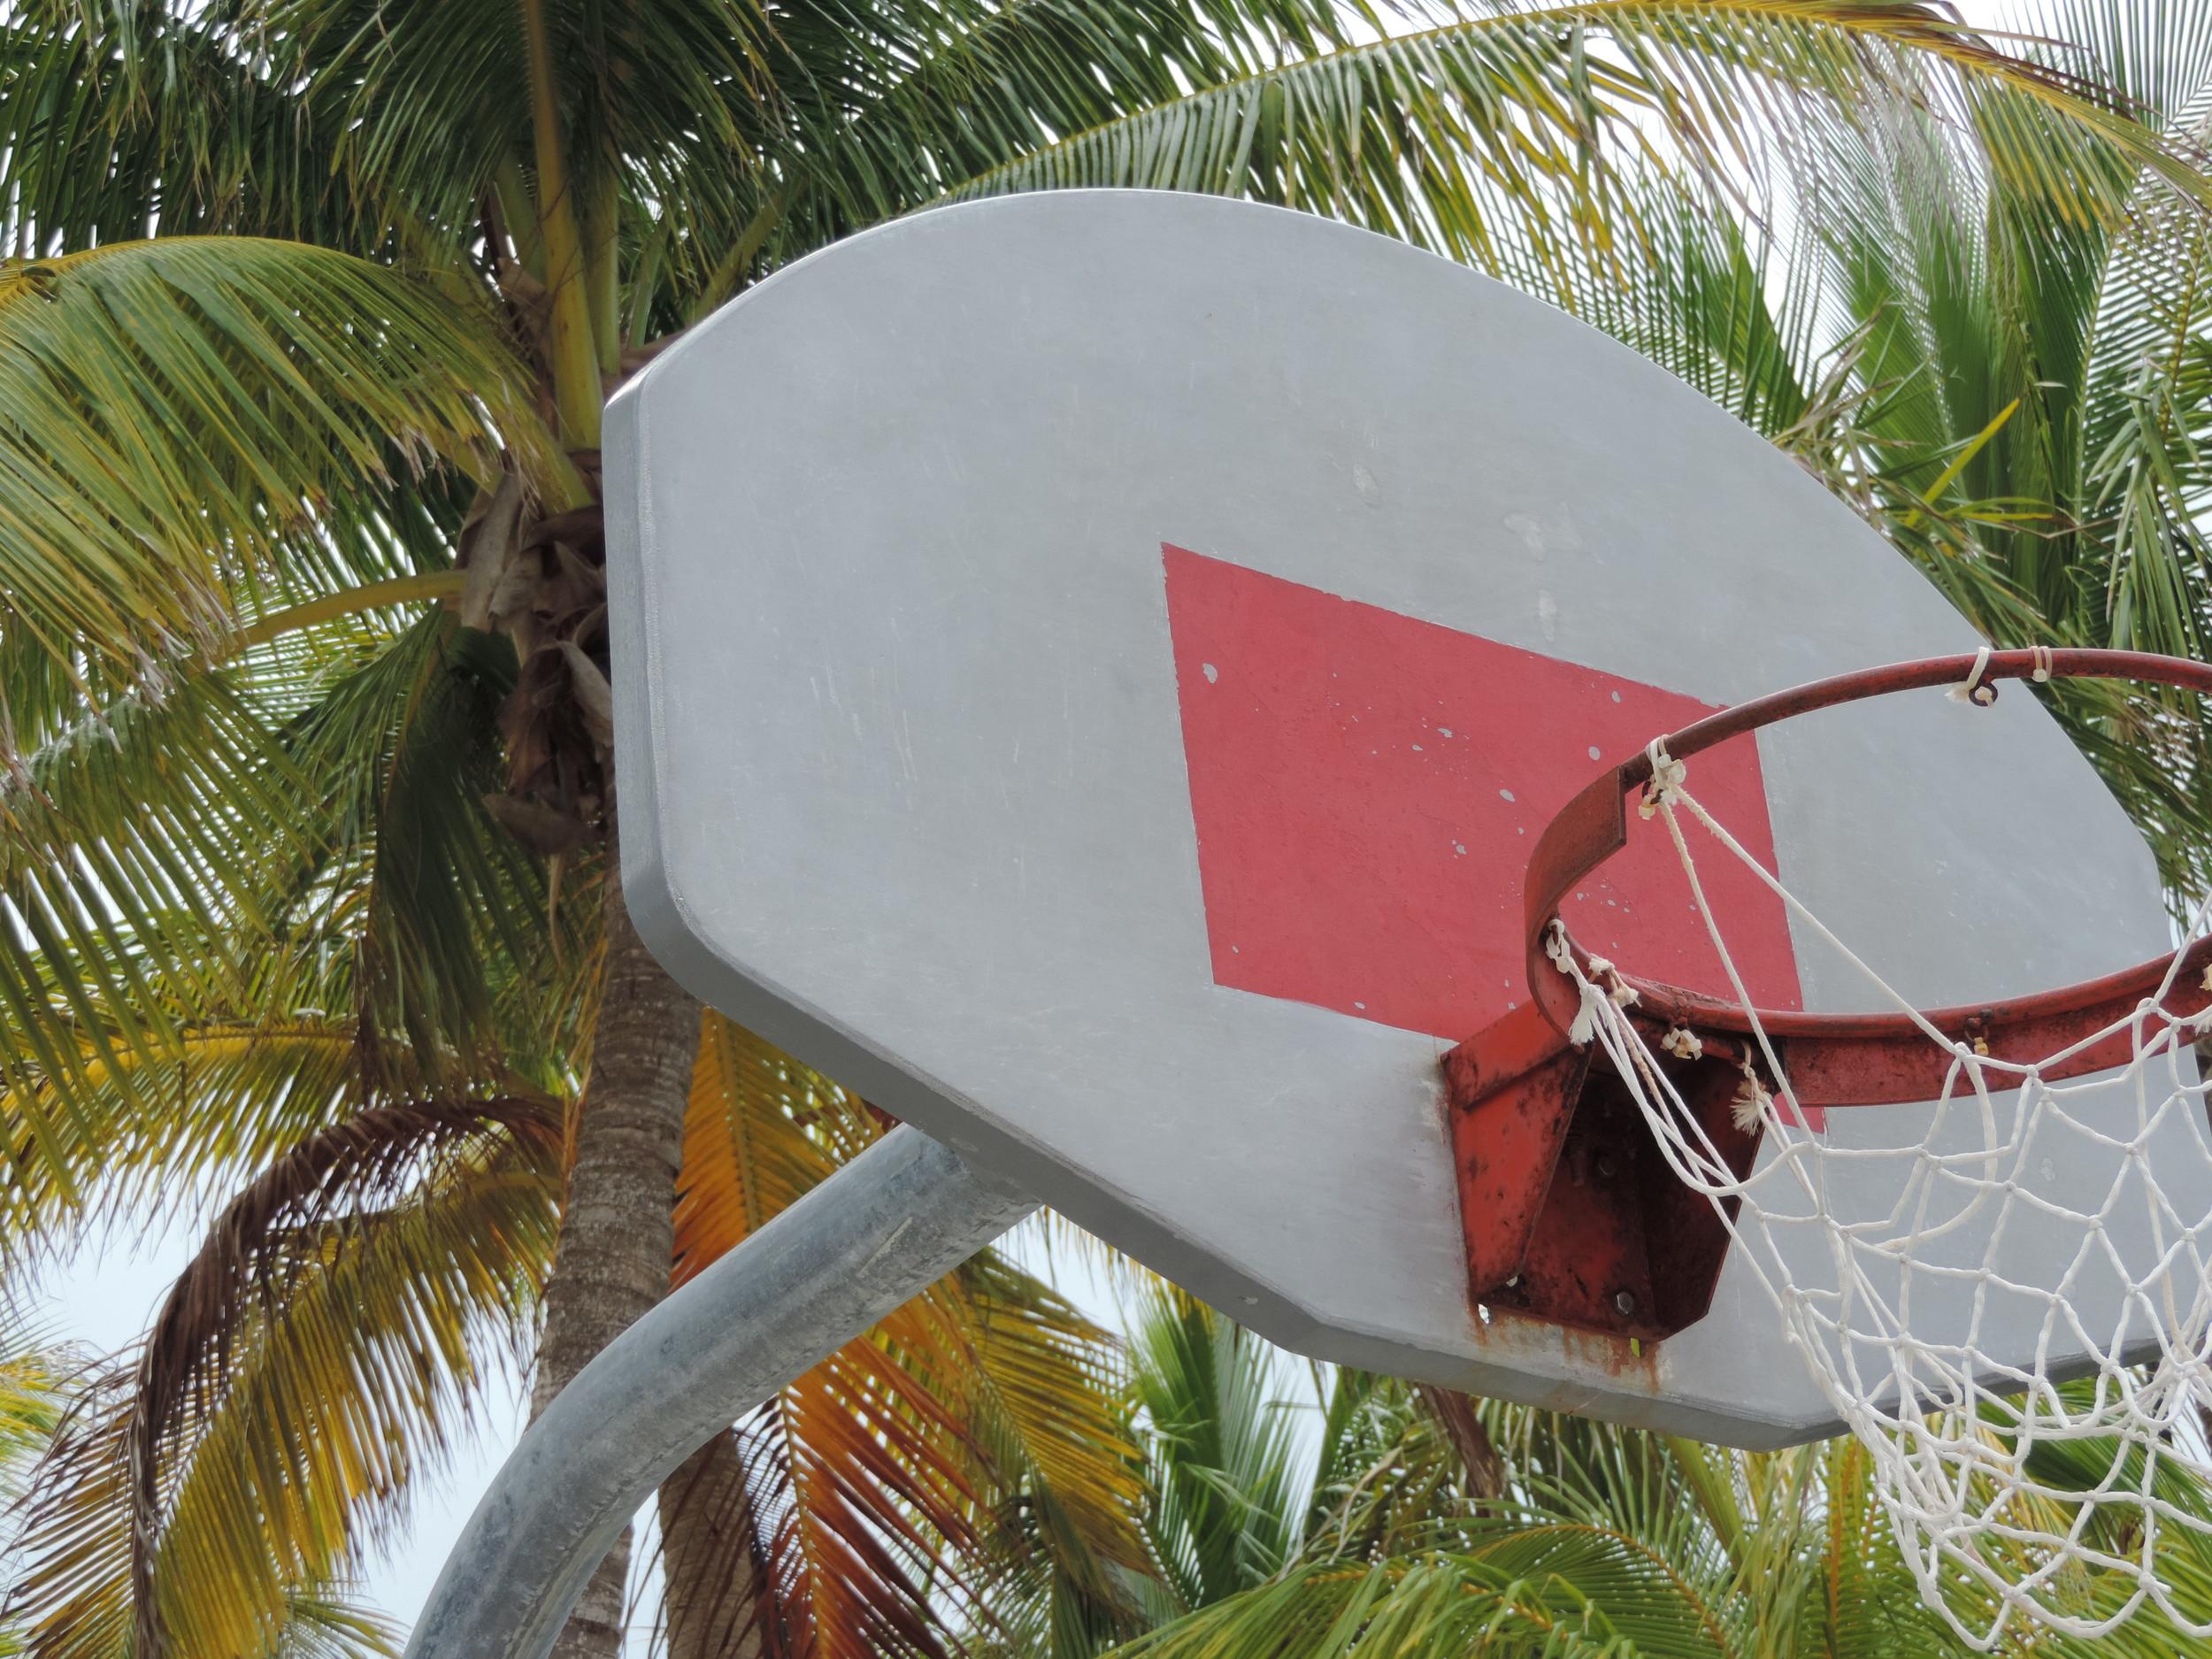 bball in tropics.JPG